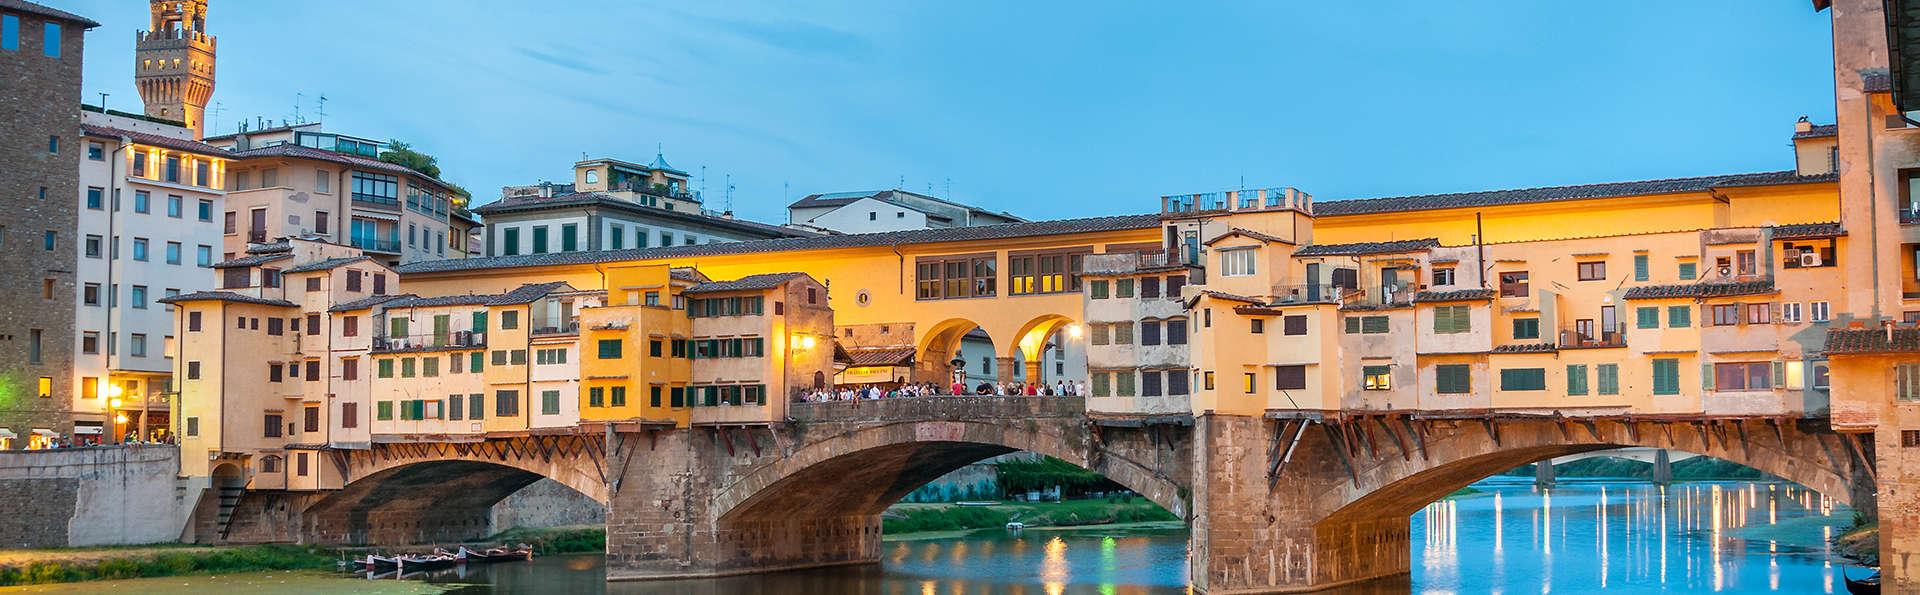 Hotel Balestri - Edit_florence.jpg